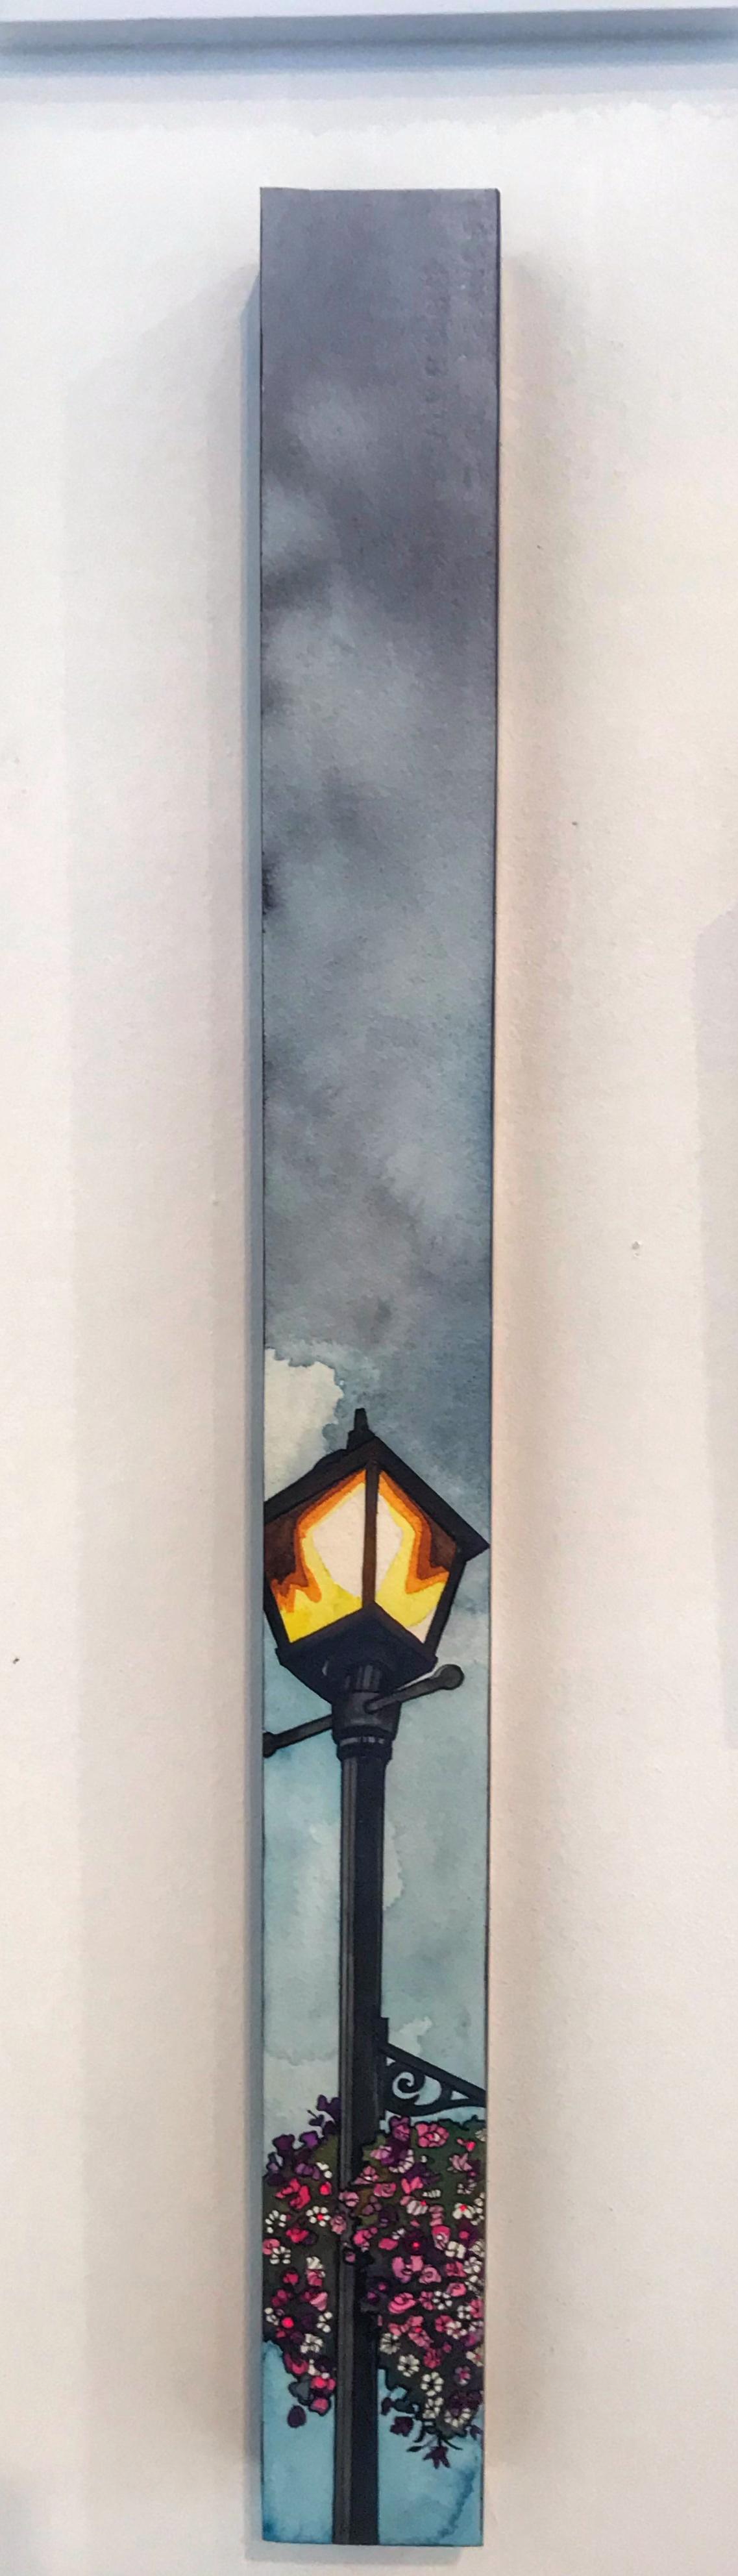 Water Street Lamp    3x30